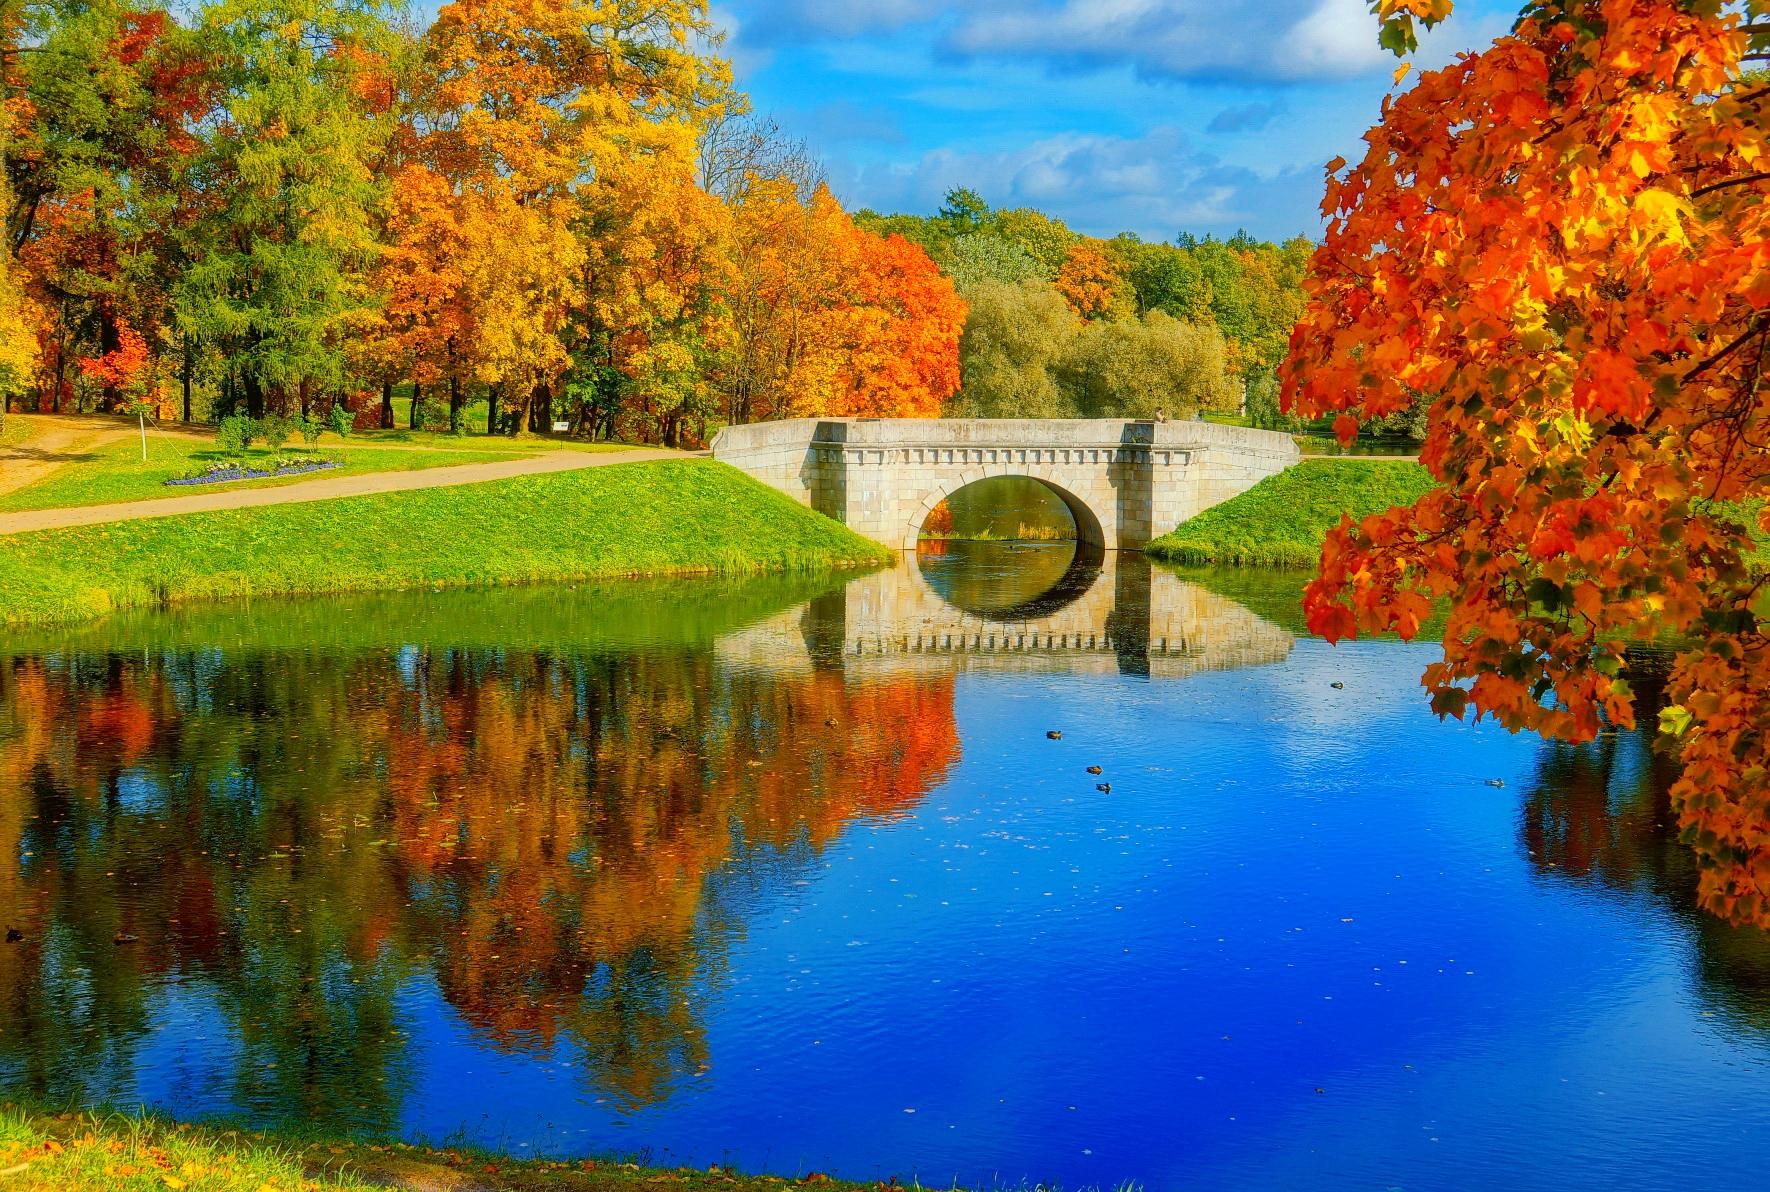 Bridge: Bridge, Fall, Earth, Nature, Lake, Tree, Reflection, Foliage, Pond, Park